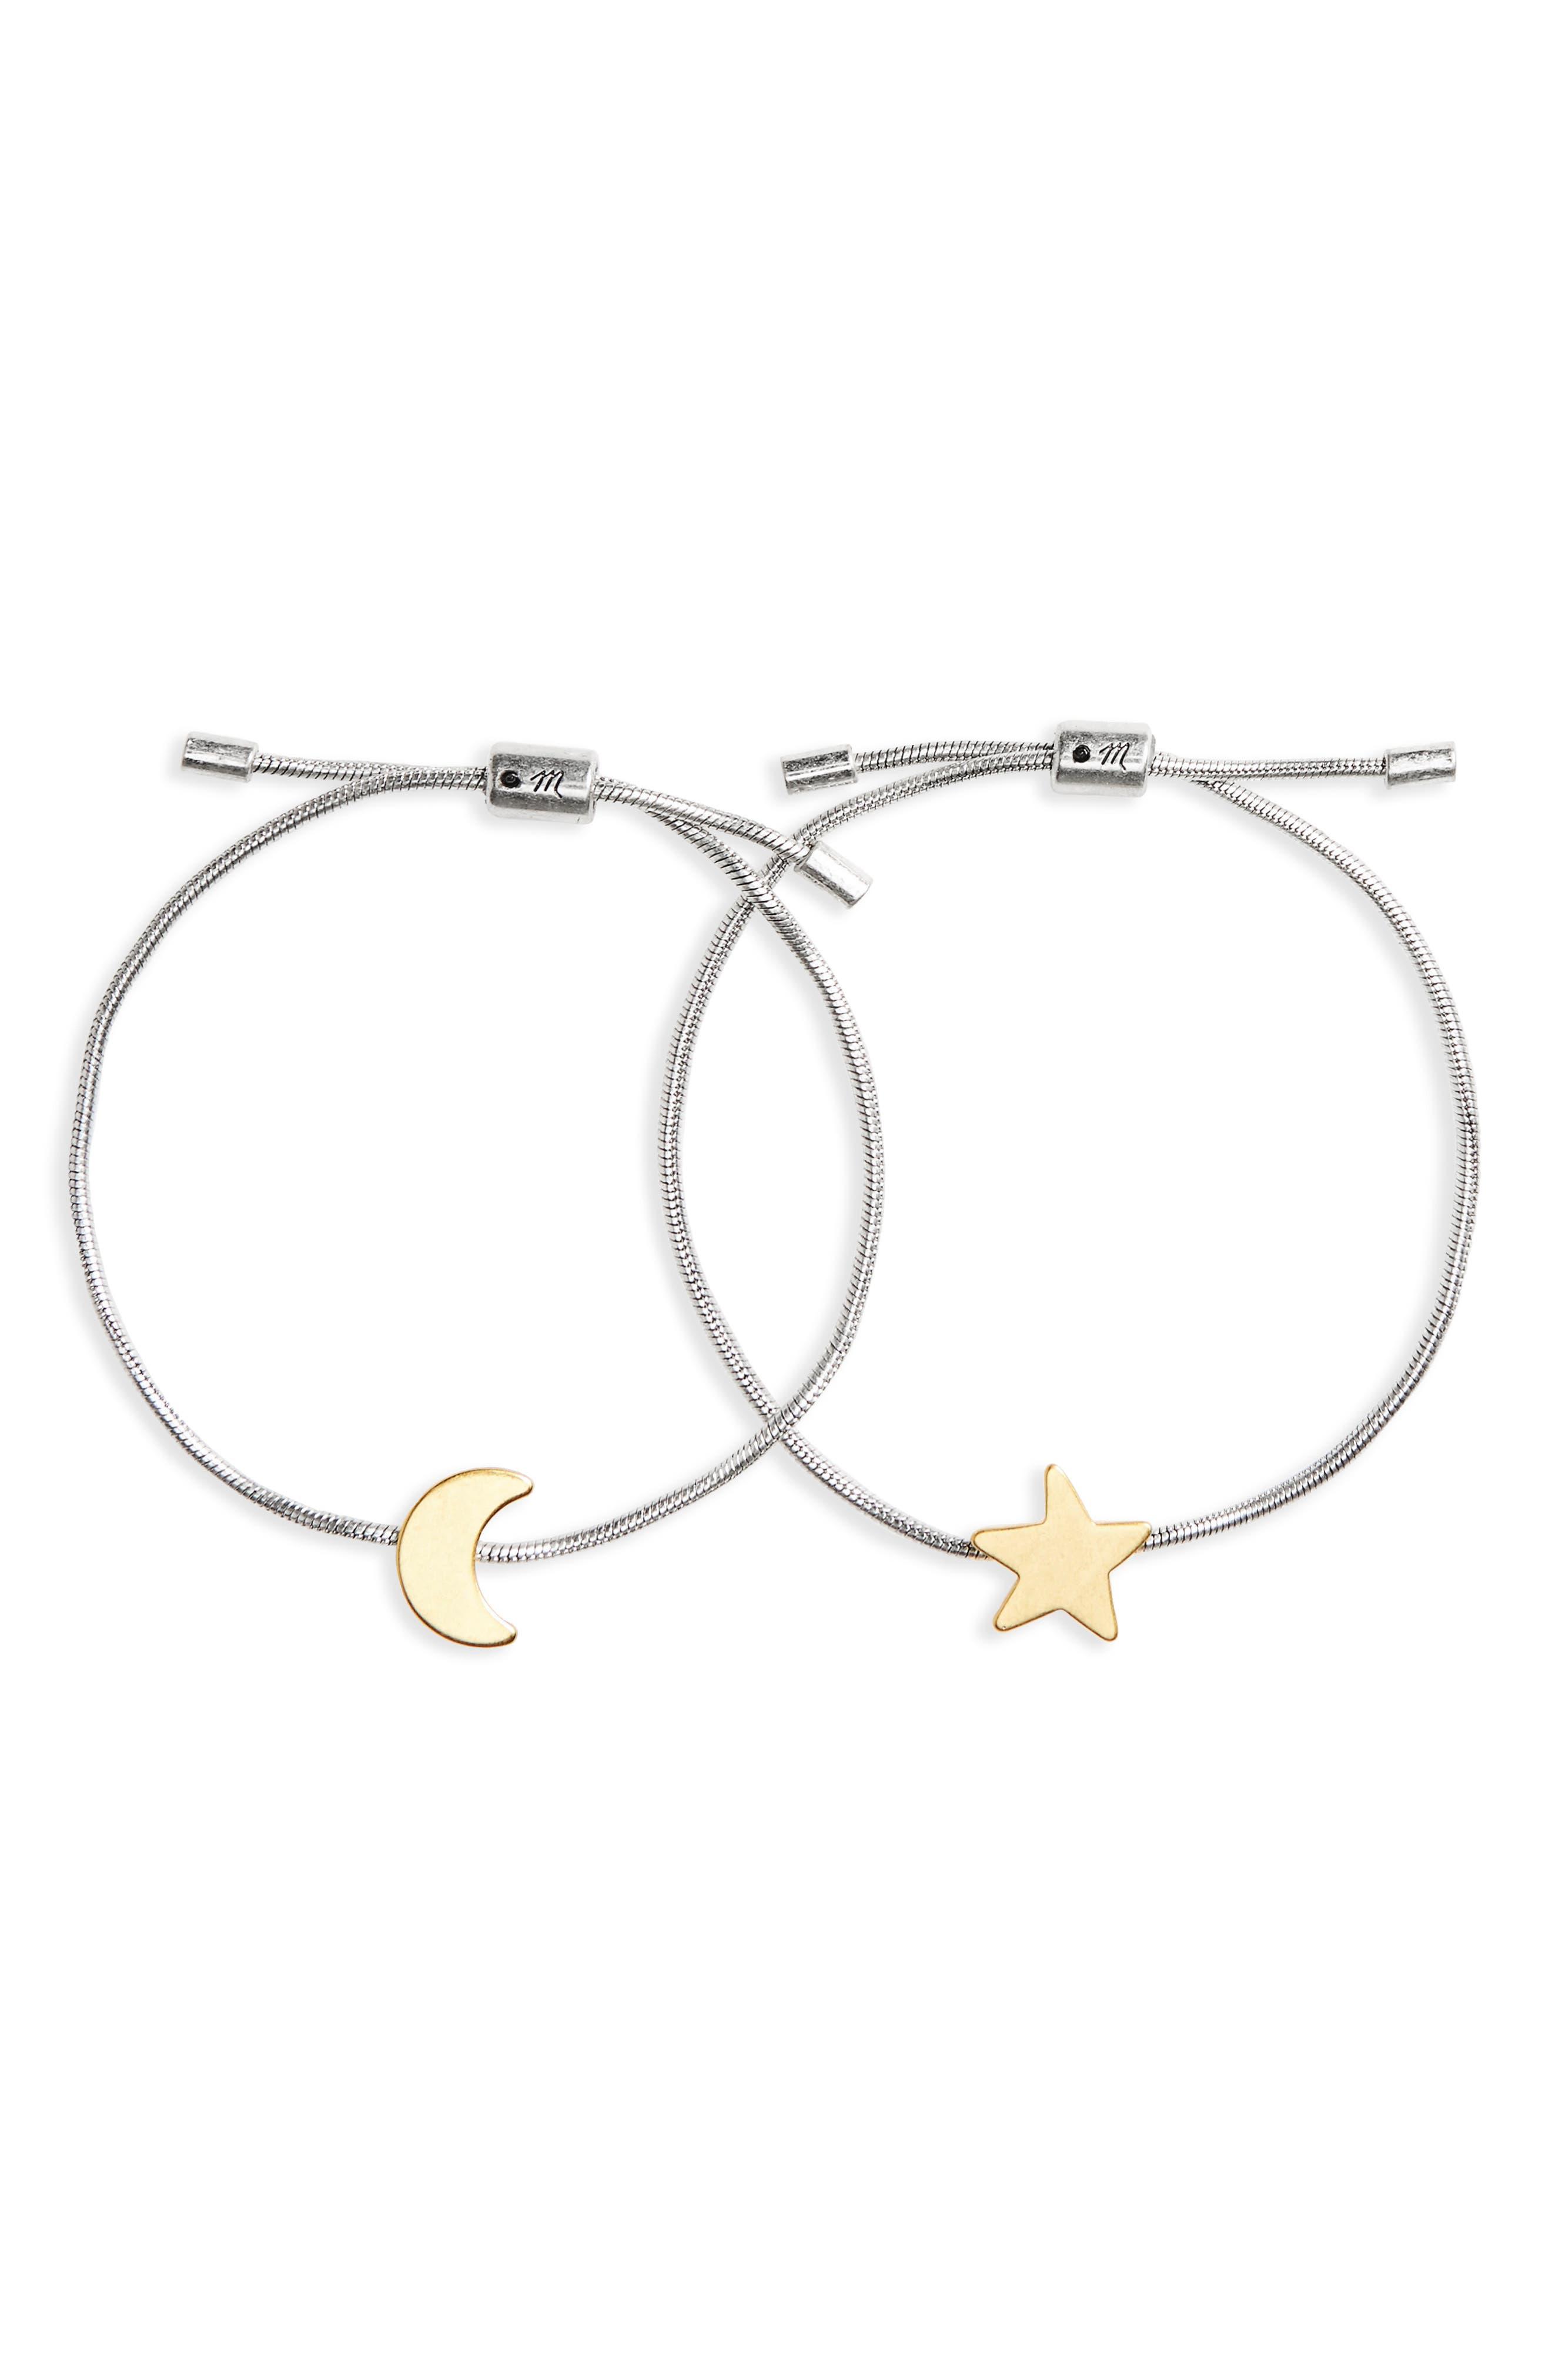 Set of 2 Friendship Bracelets,                         Main,                         color, 710